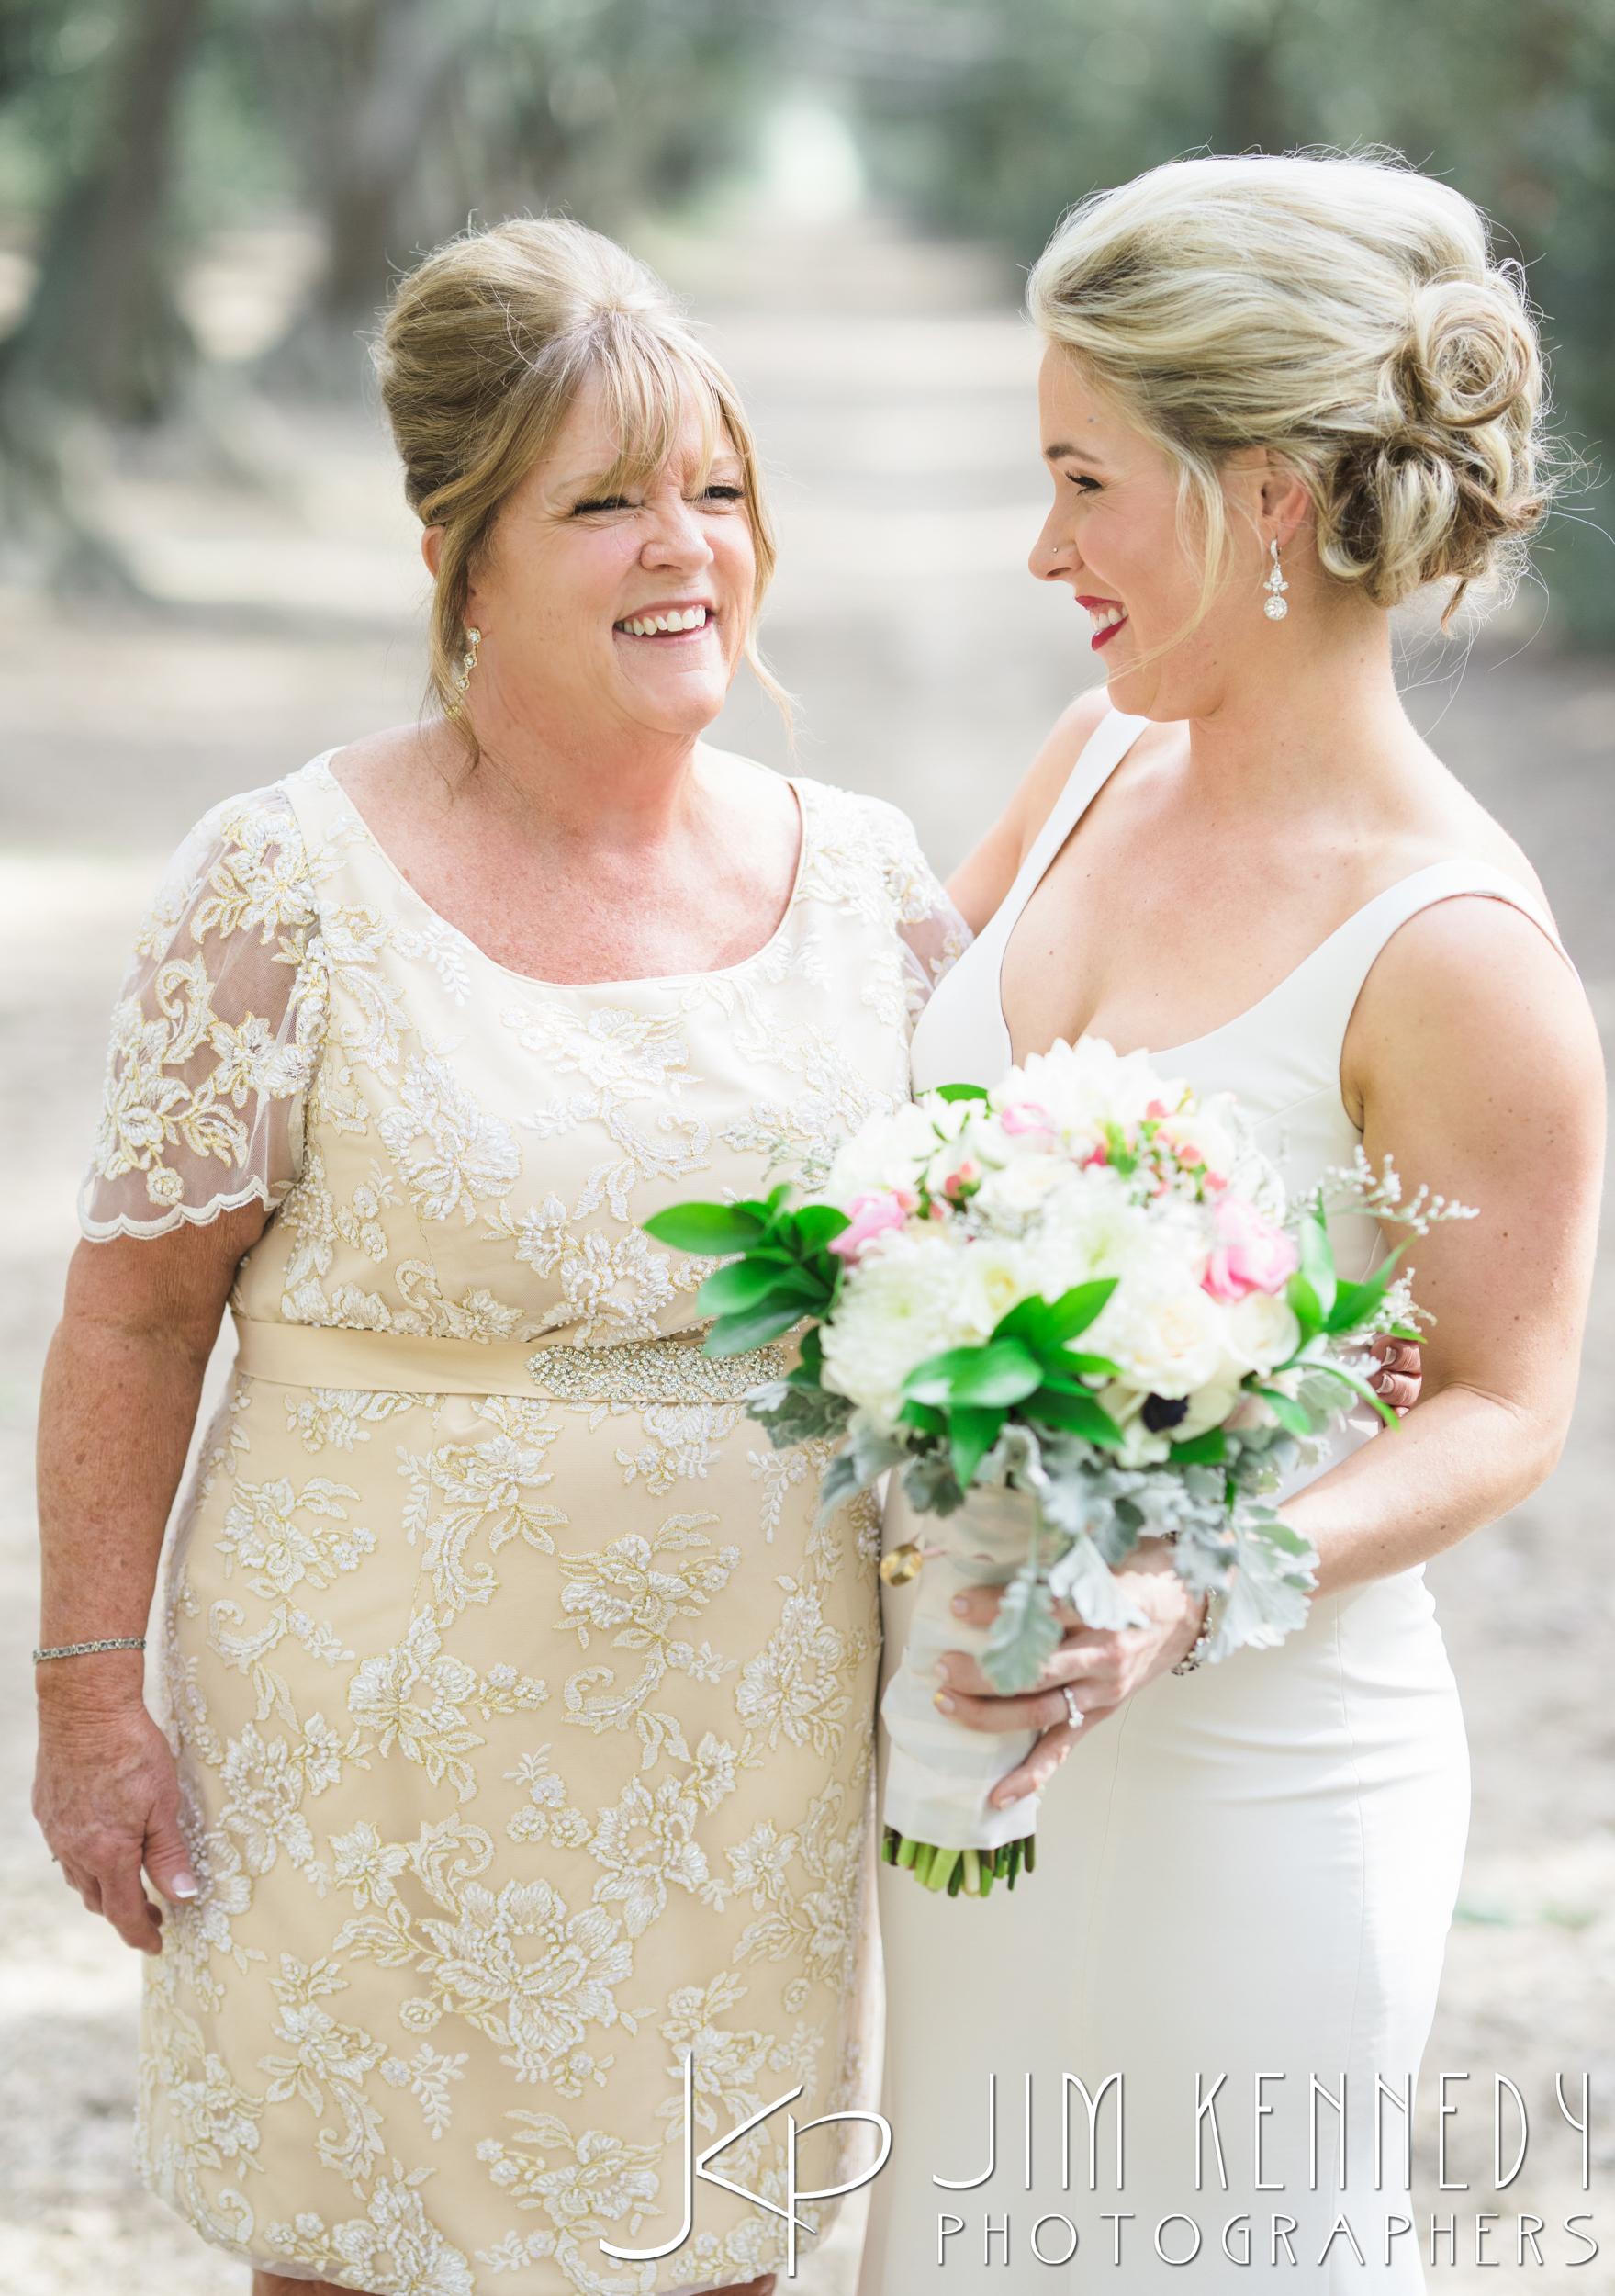 jim_kennedy_photographers_highland_springs_wedding_caitlyn_0070.jpg